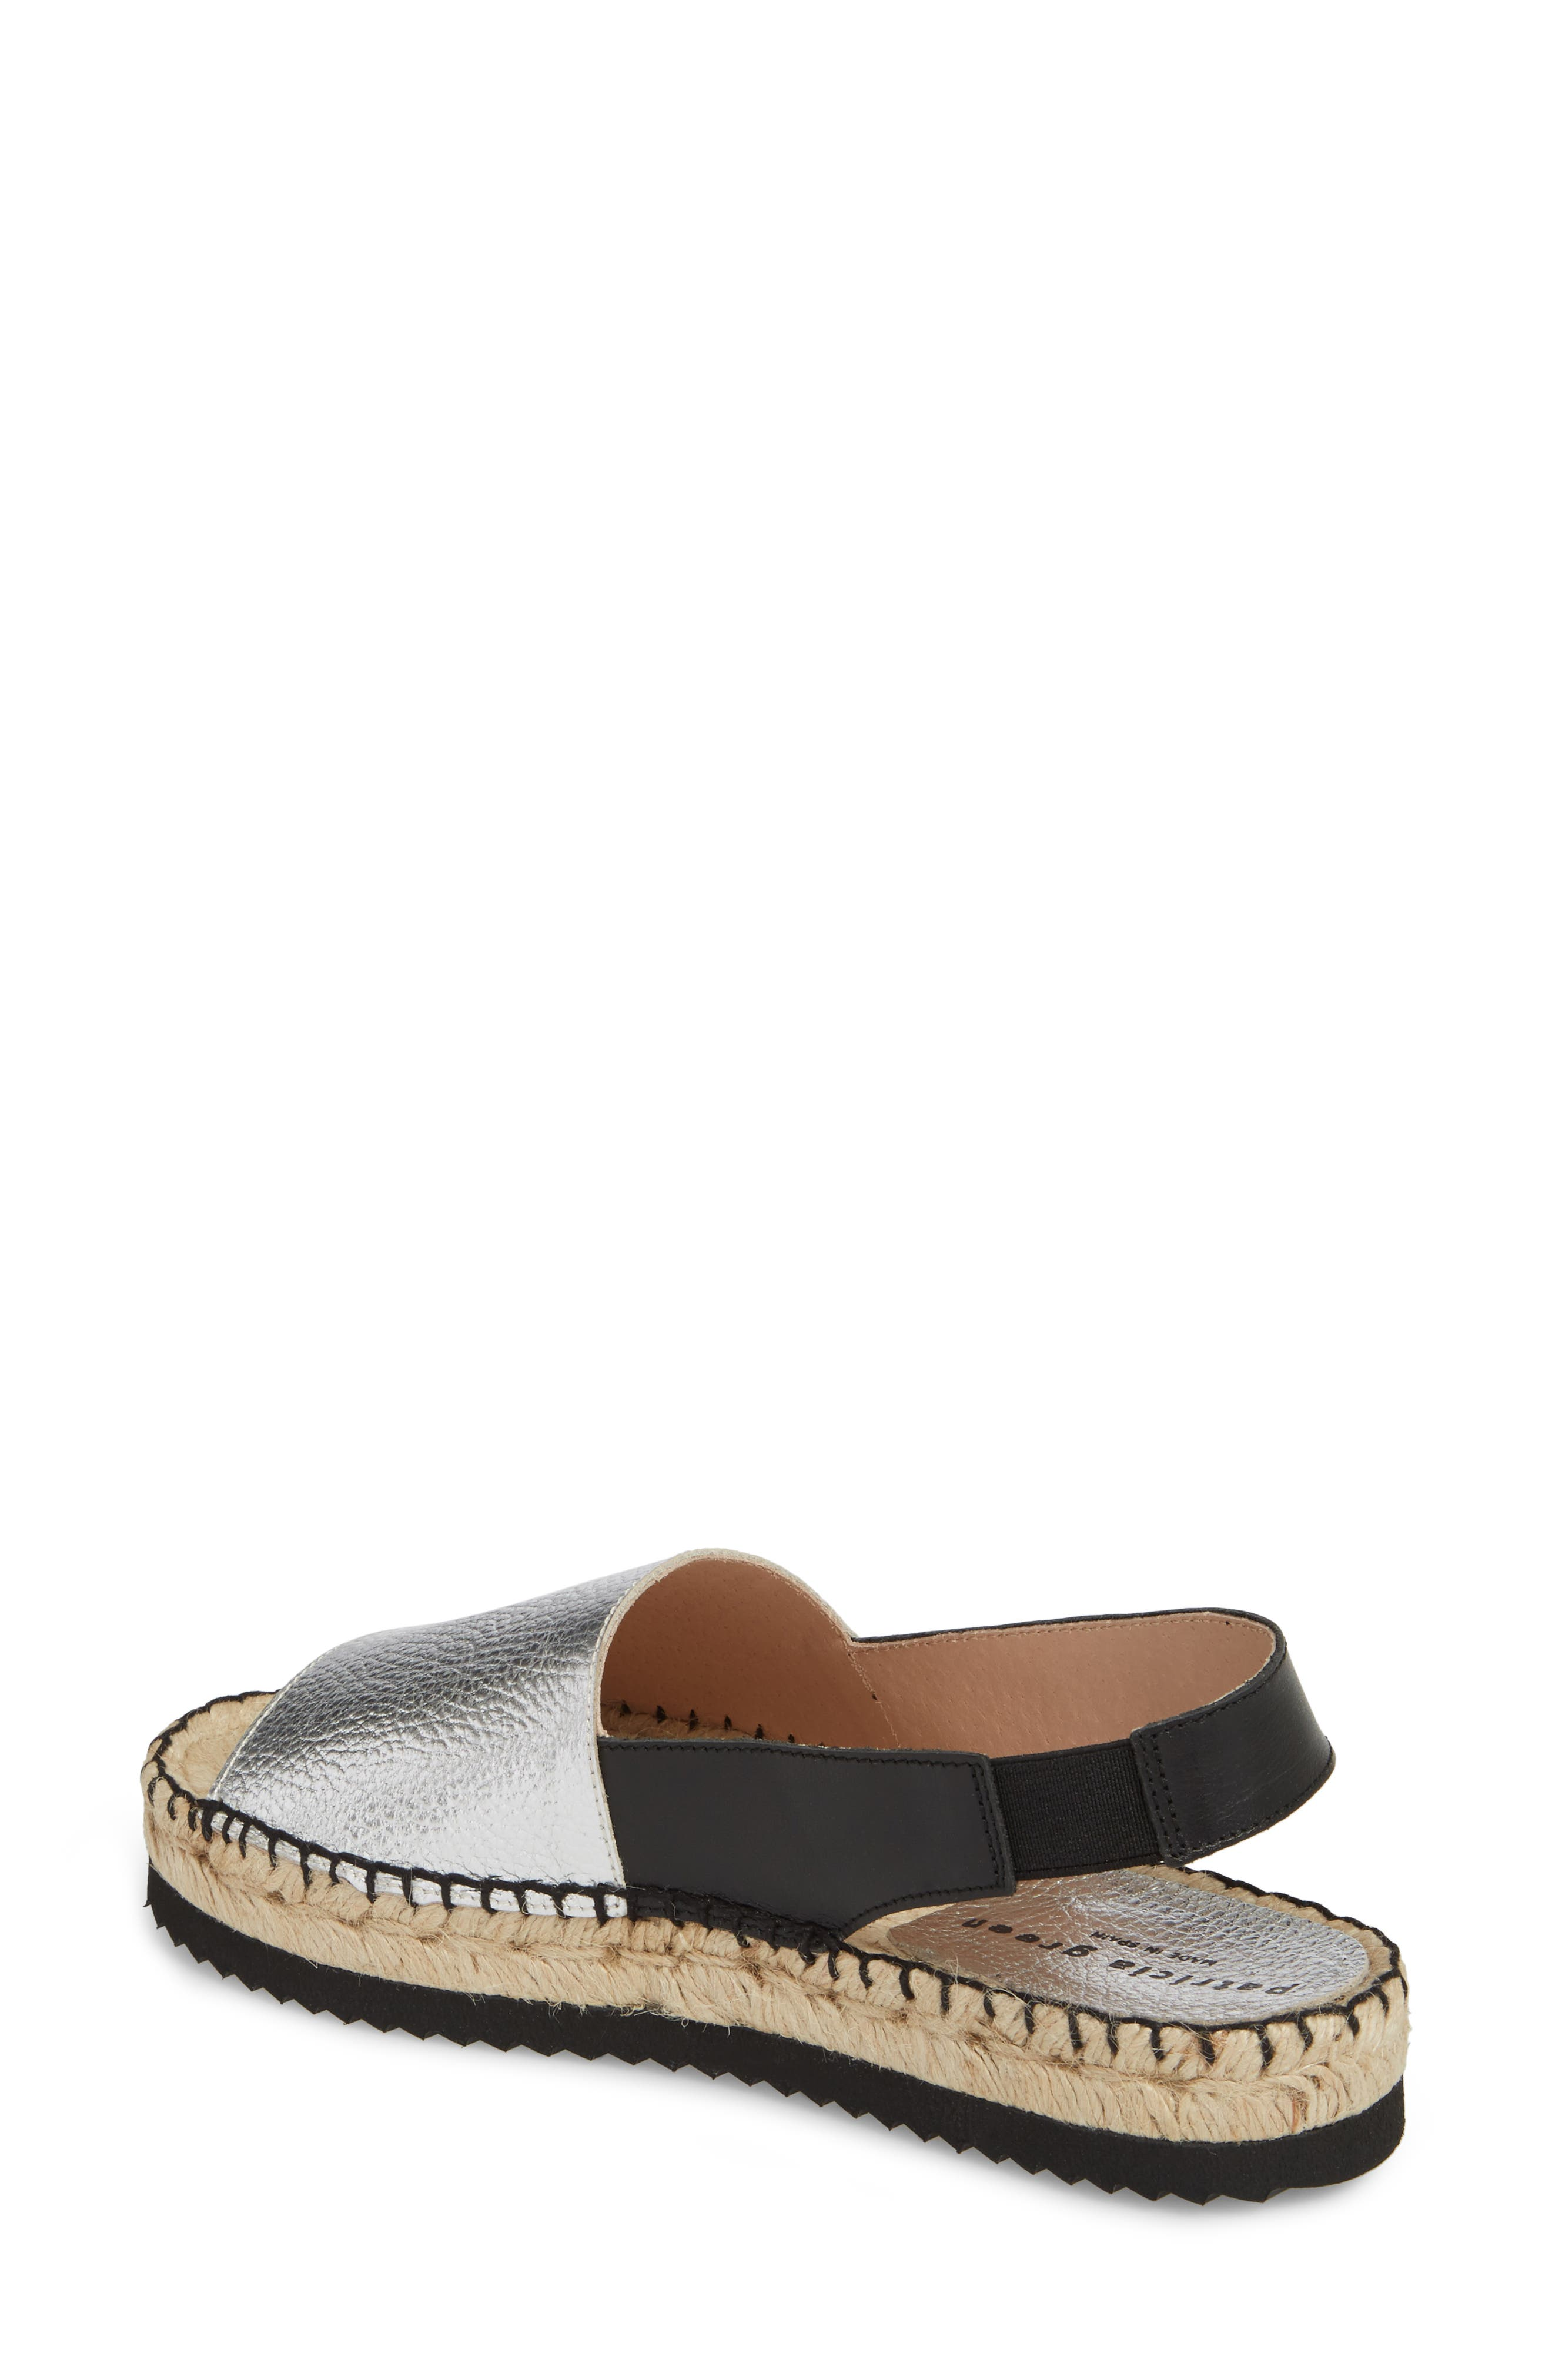 Soho Platform Espadrille Sandal,                             Alternate thumbnail 2, color,                             Silver Suede